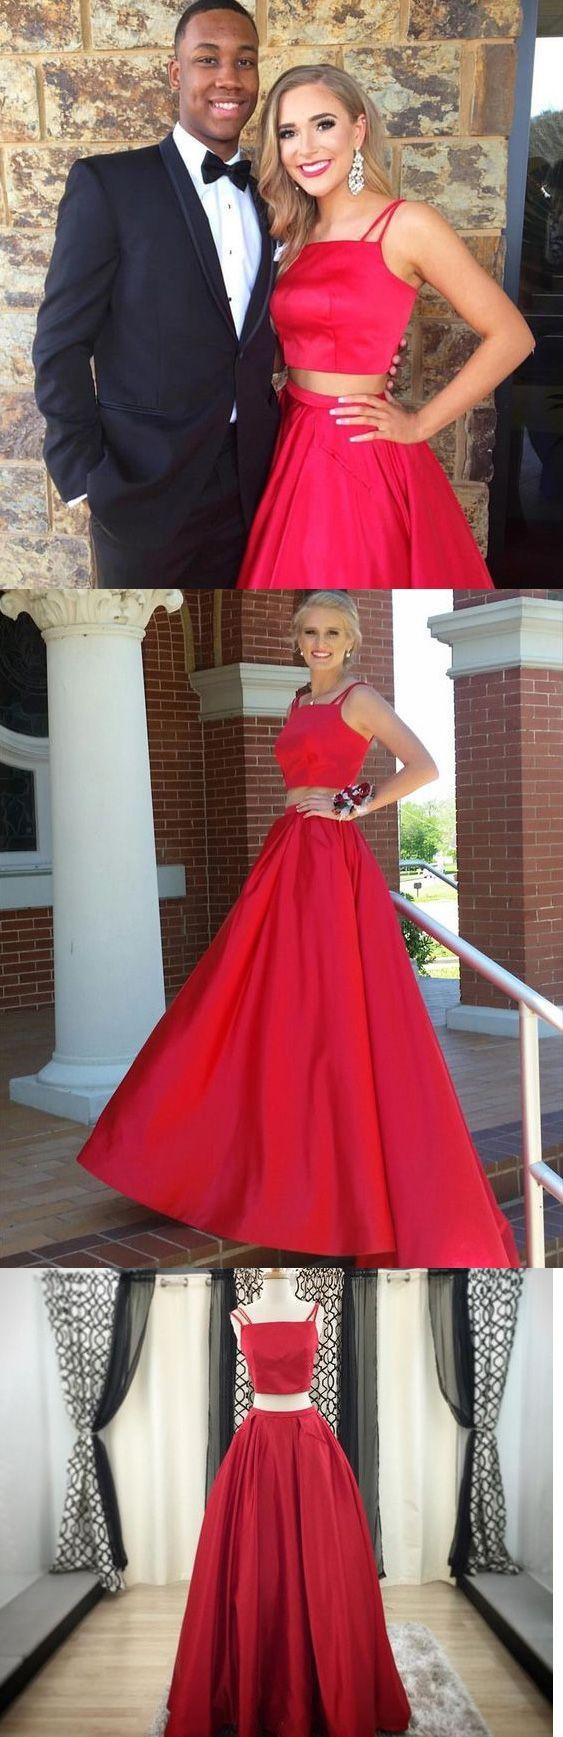 best long prom dresses images on pinterest party wear dresses